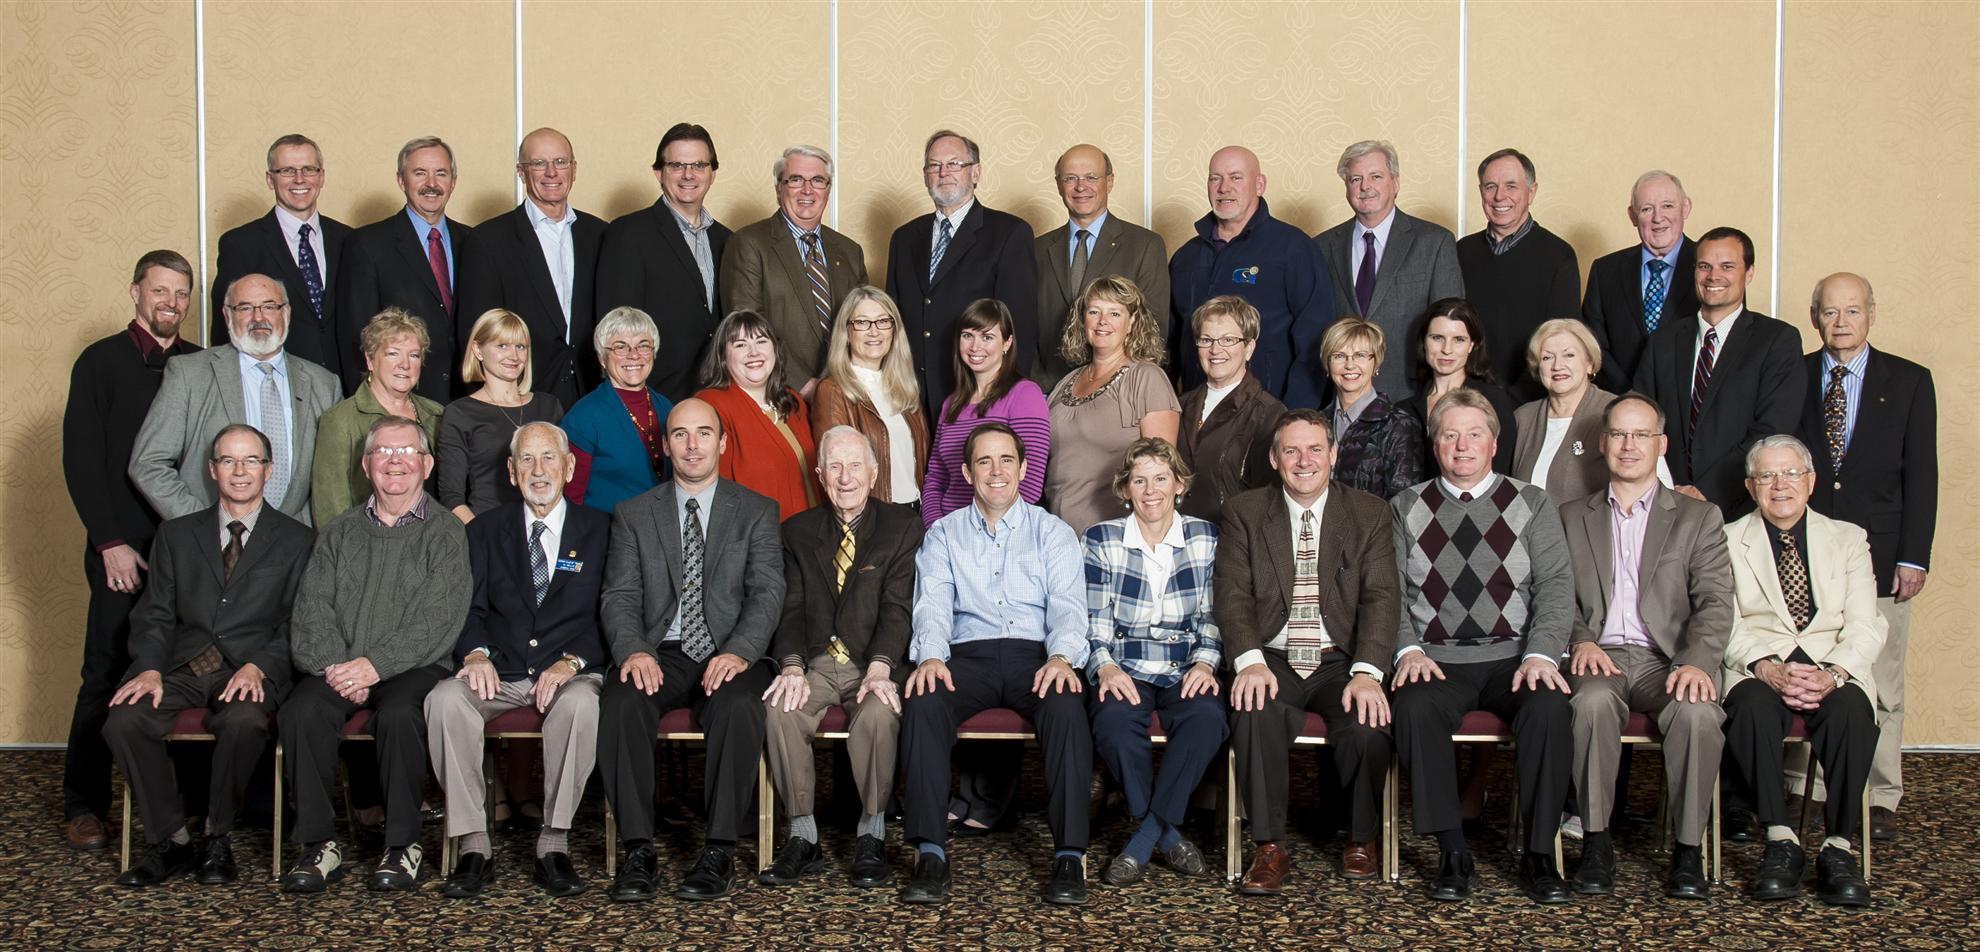 2013-14 Group Photo